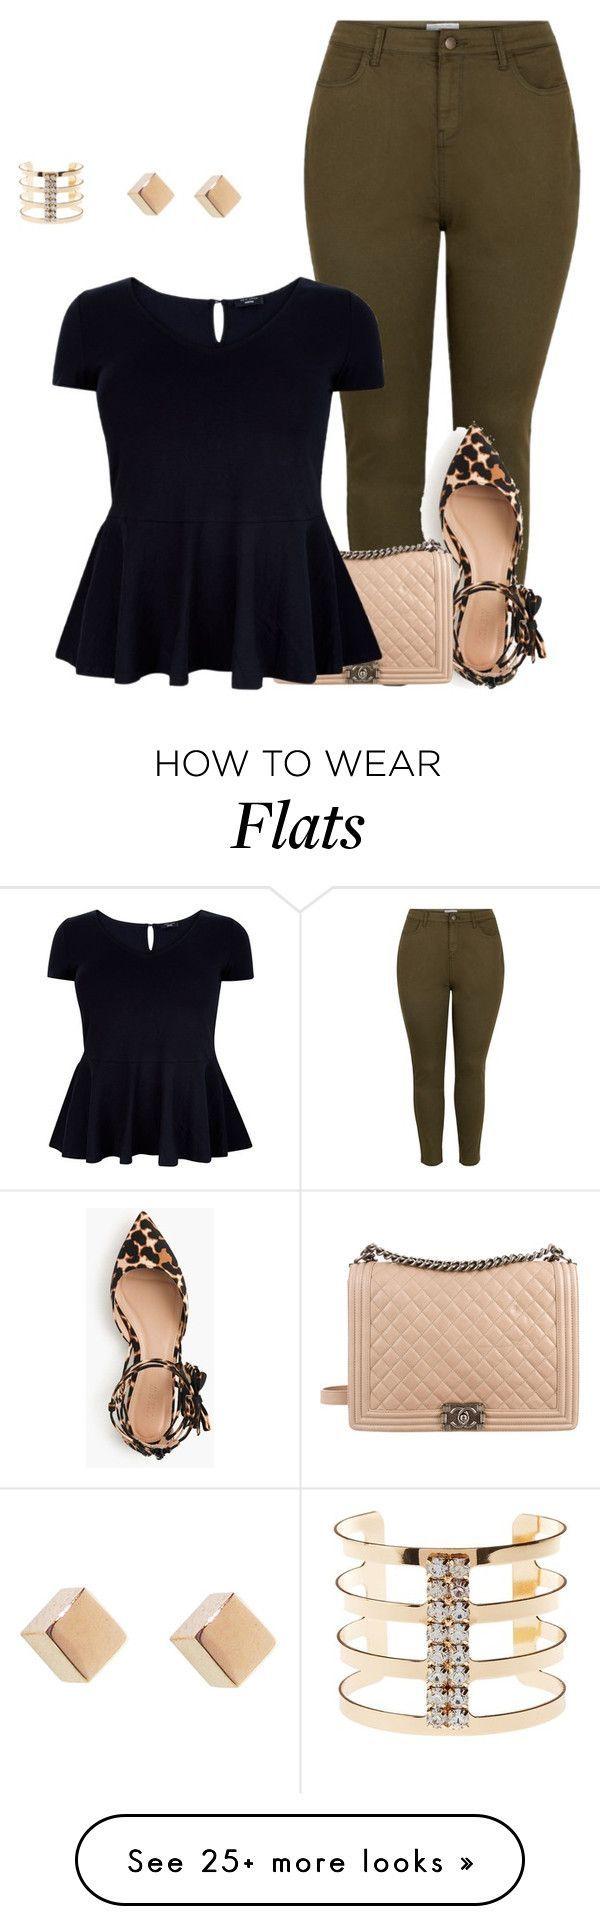 cool Flats Sets by http://www.polyvorebydana.us/curvy-girl-fashion/flats-sets/